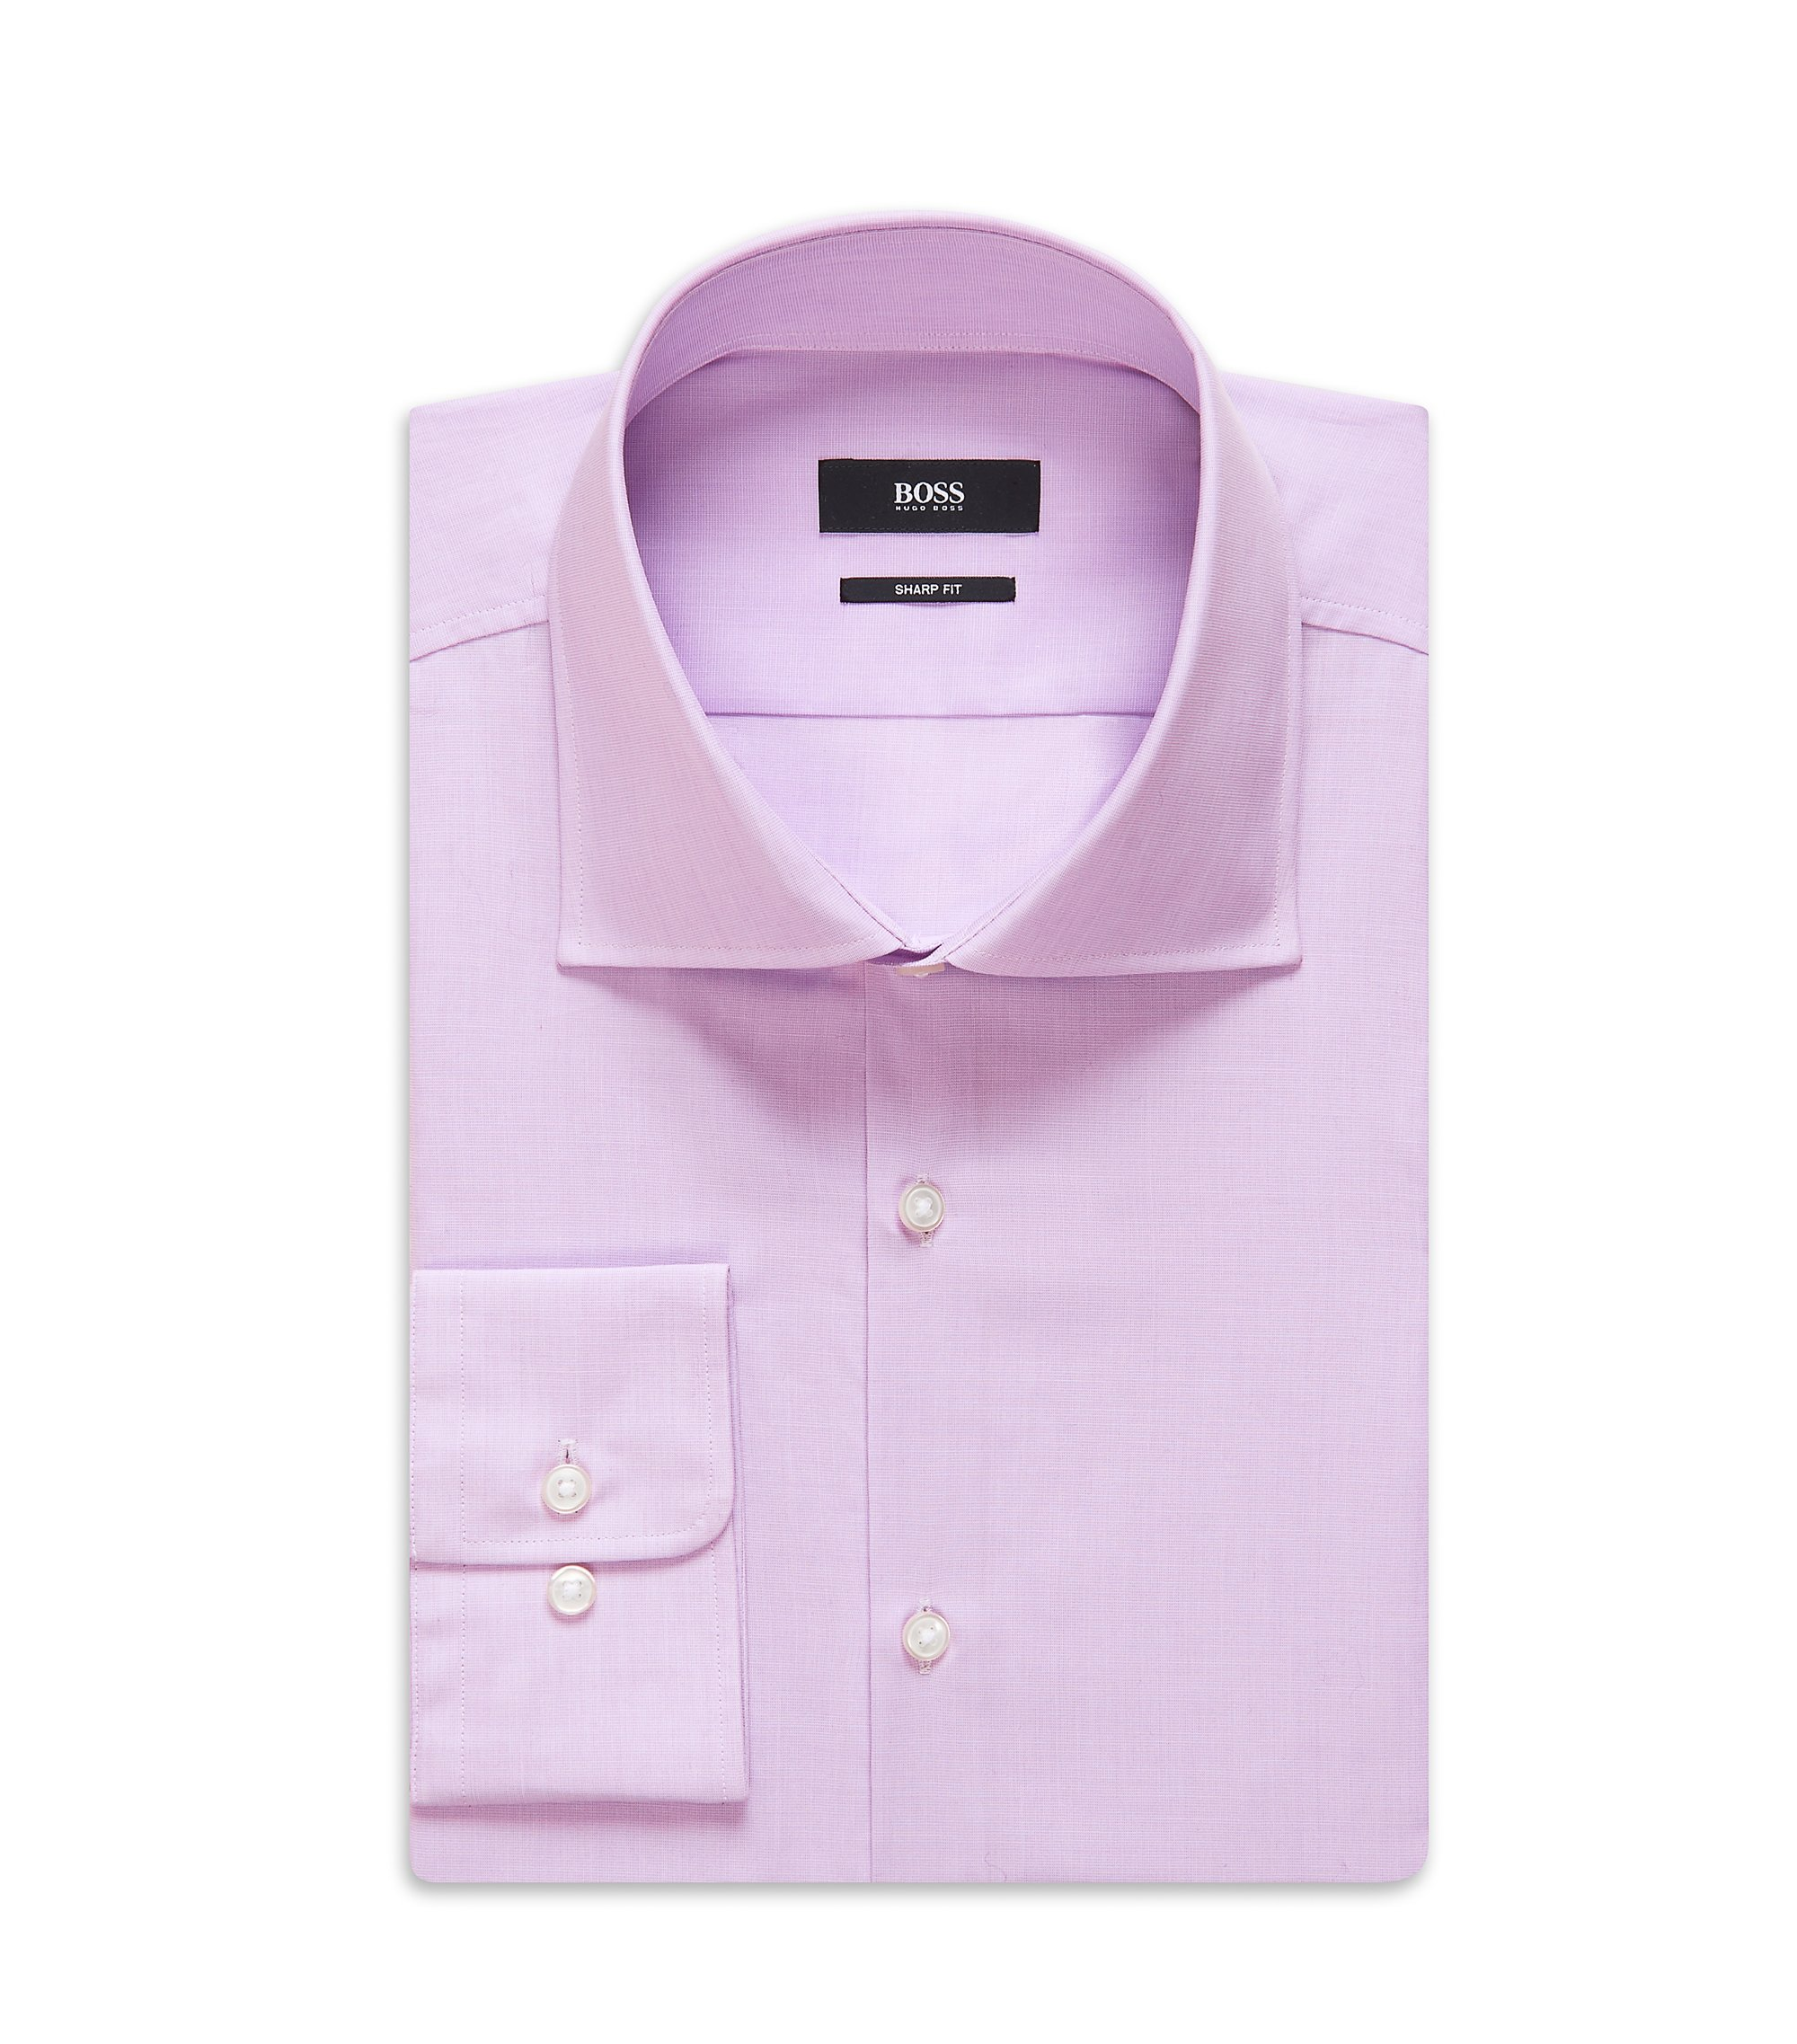 Cotton Dress Shirt, Sharp Fit | Miles US, Light Purple